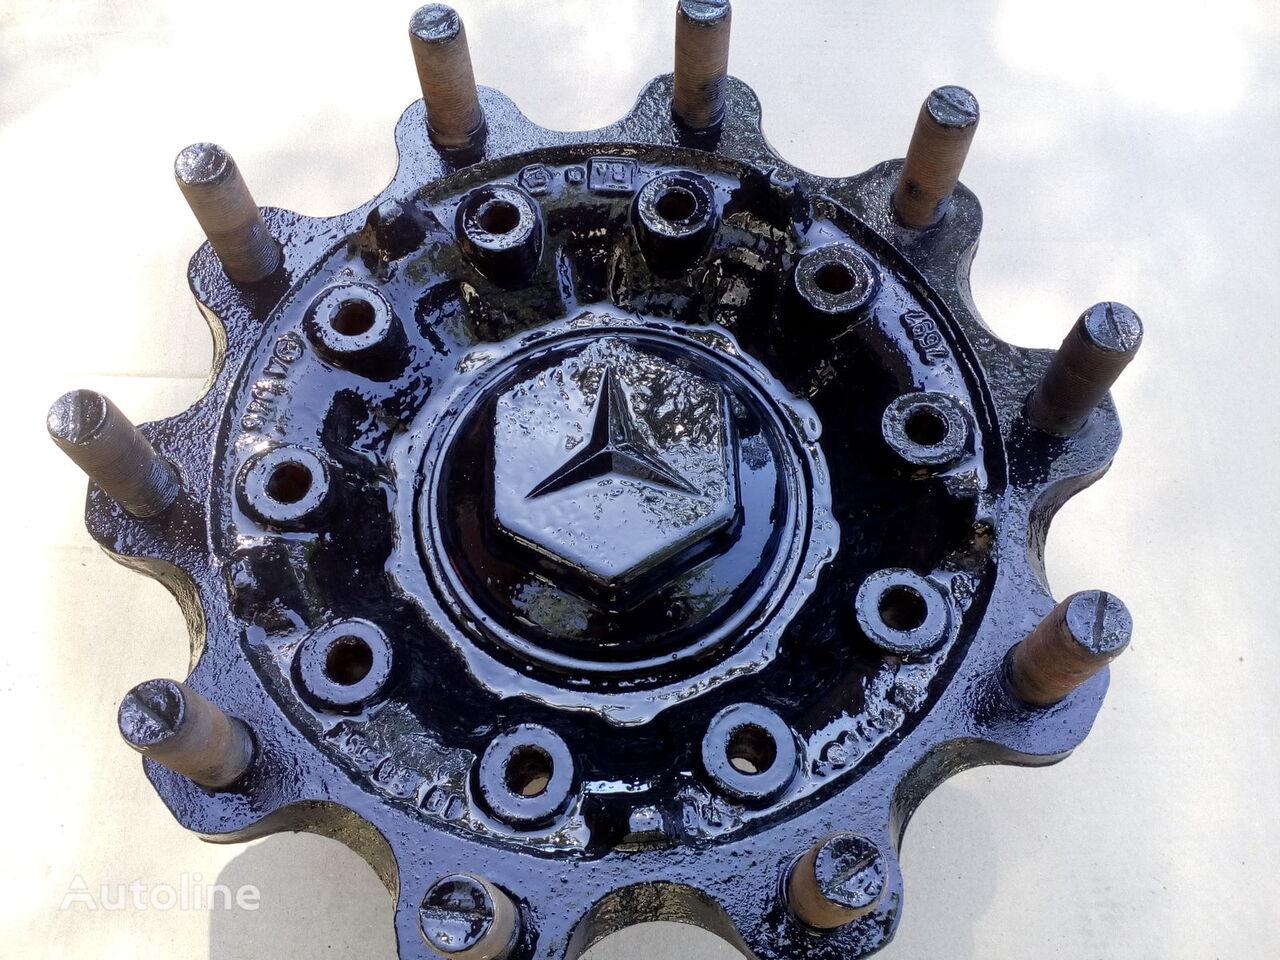 MERCEDES-BENZ wheel hub for SCHMITZ CARGOBULL Schwarzmüller, Fruehauf, Kögel, Vanhool, Samro, Krone semi-trailer